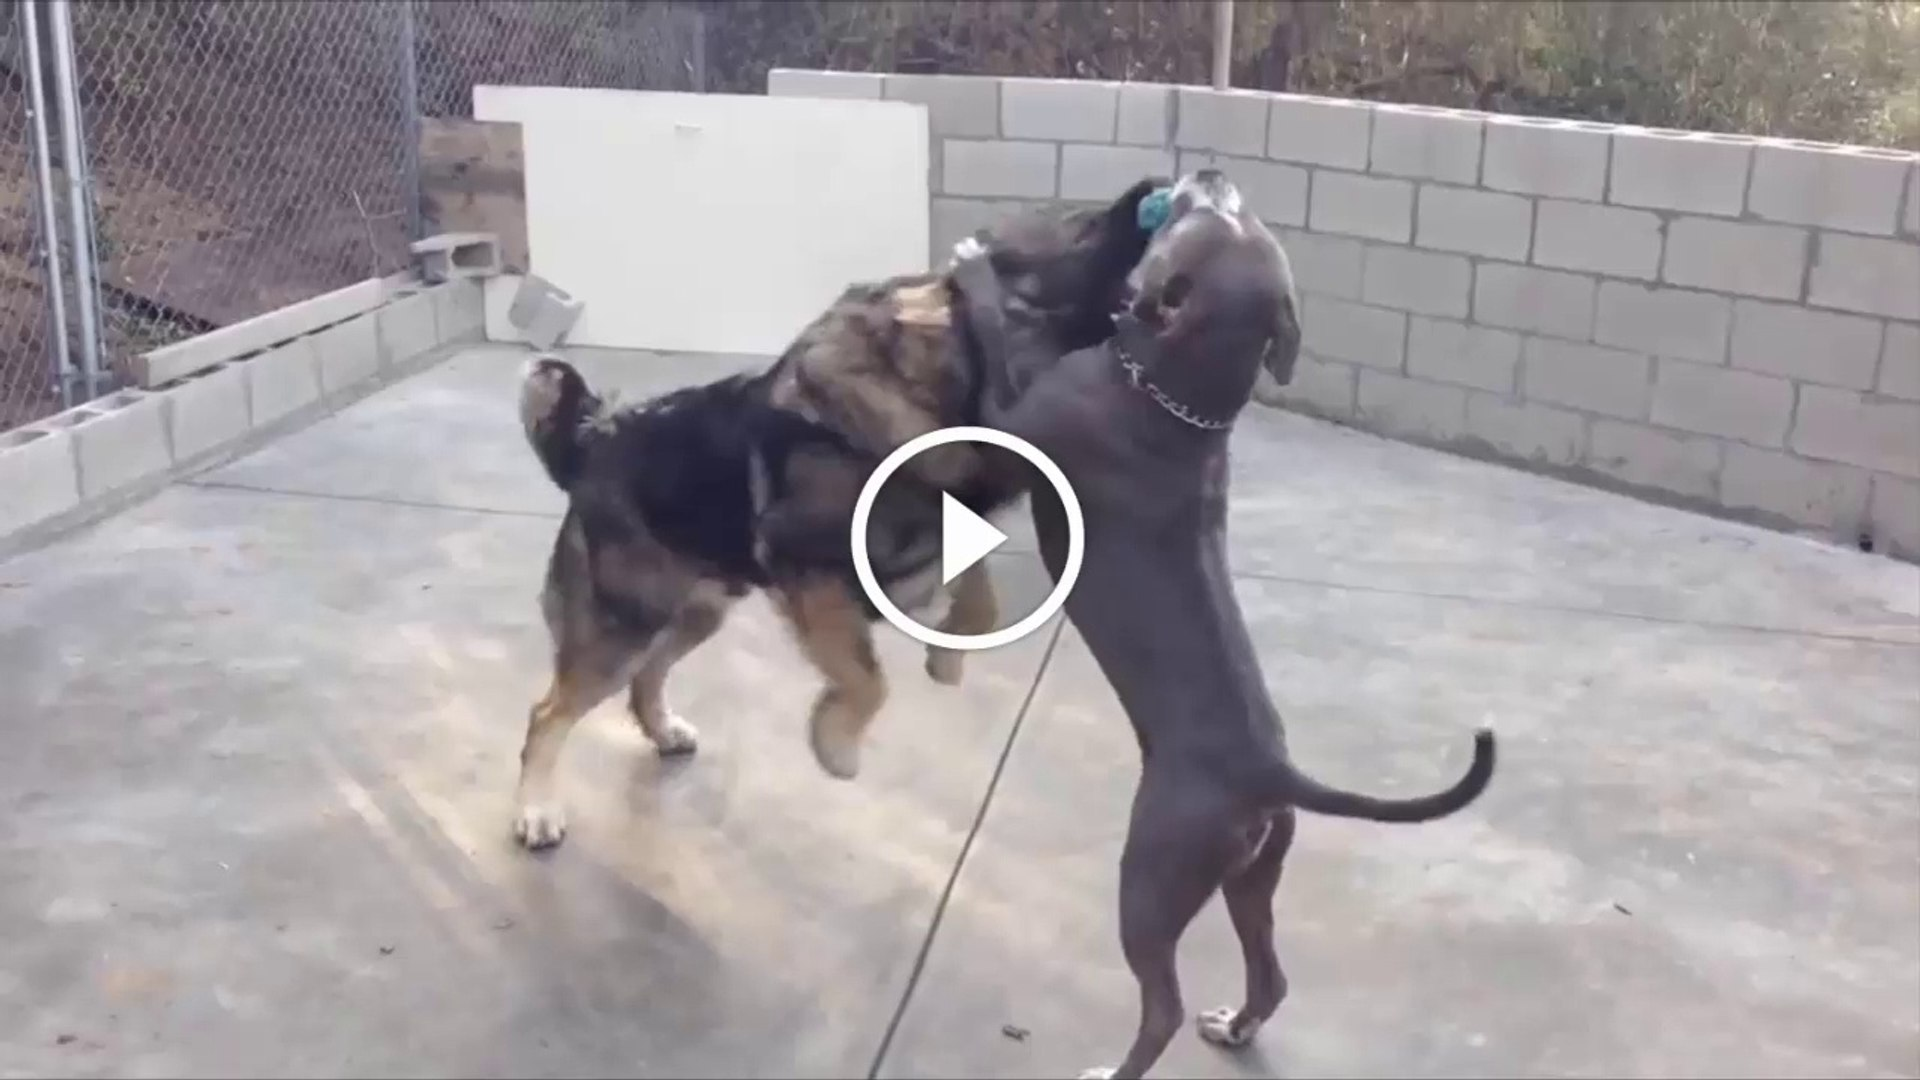 PiTBULL KOPEGi vs KAFKAS COBAN KOPEGi - PiTBULL DOG vs CAUCASiAN MOUNTAiN DOG